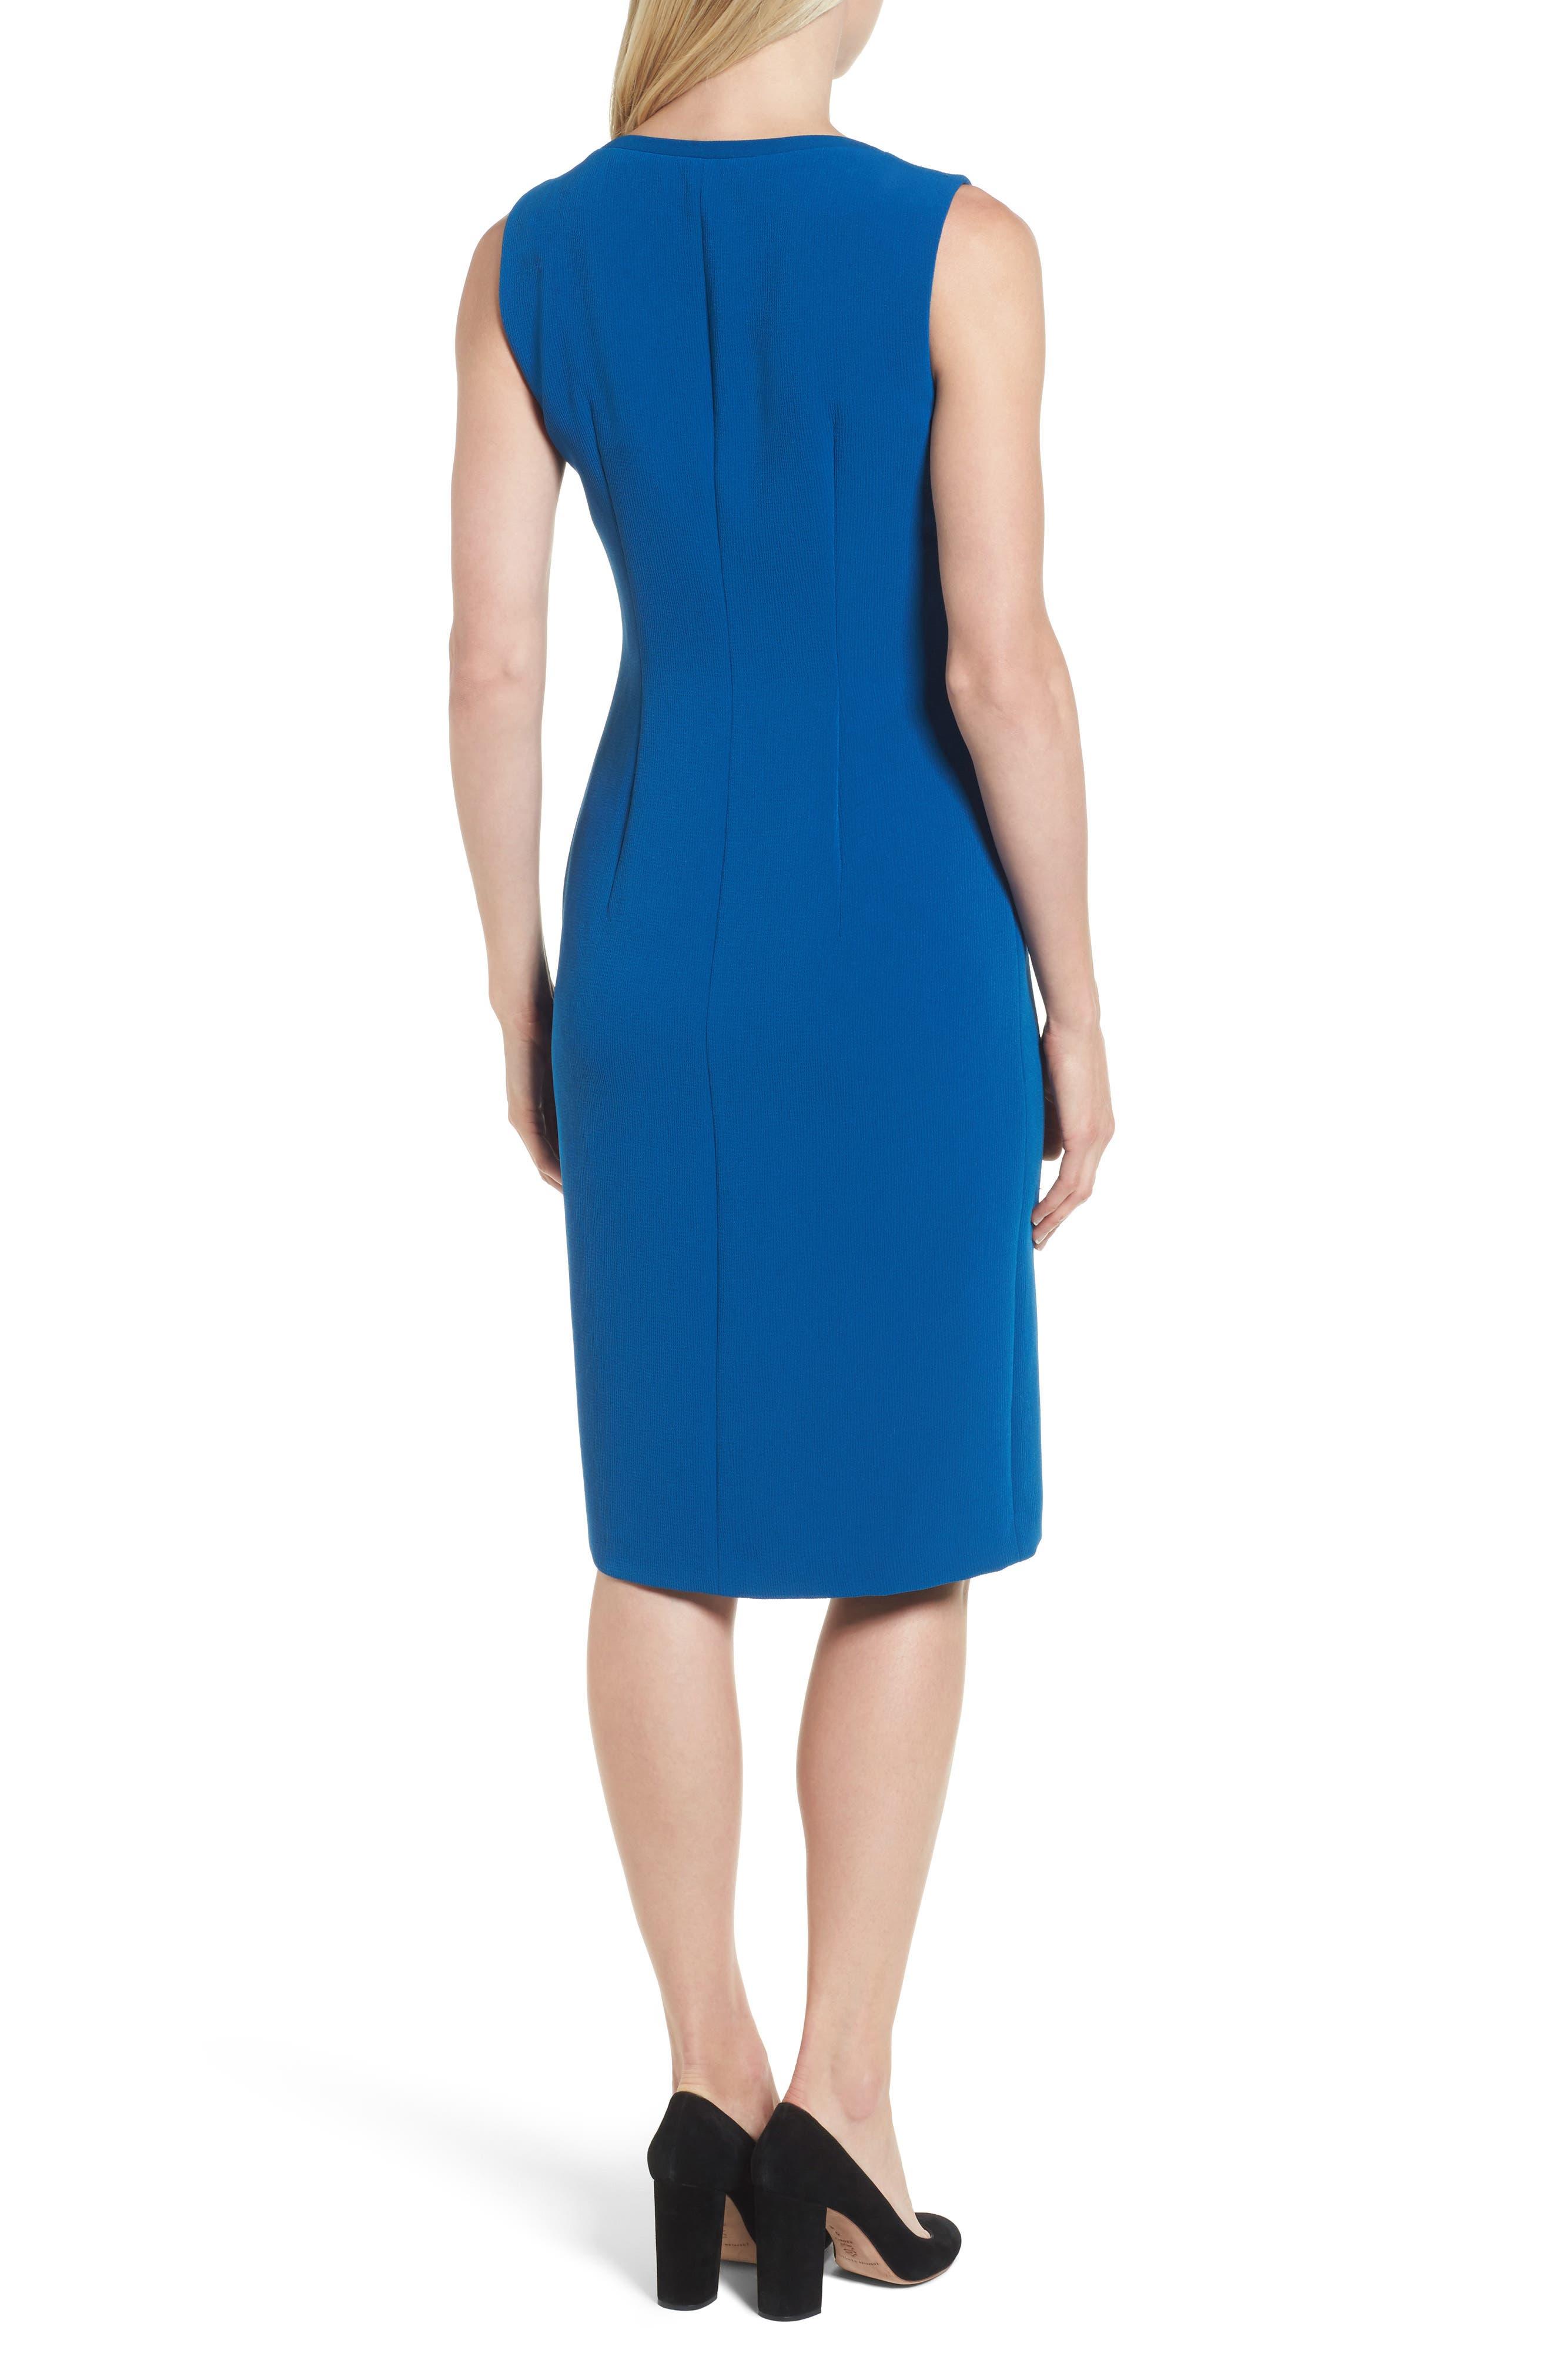 Danafea Zip Detail Sheath Dress,                             Alternate thumbnail 2, color,                             424